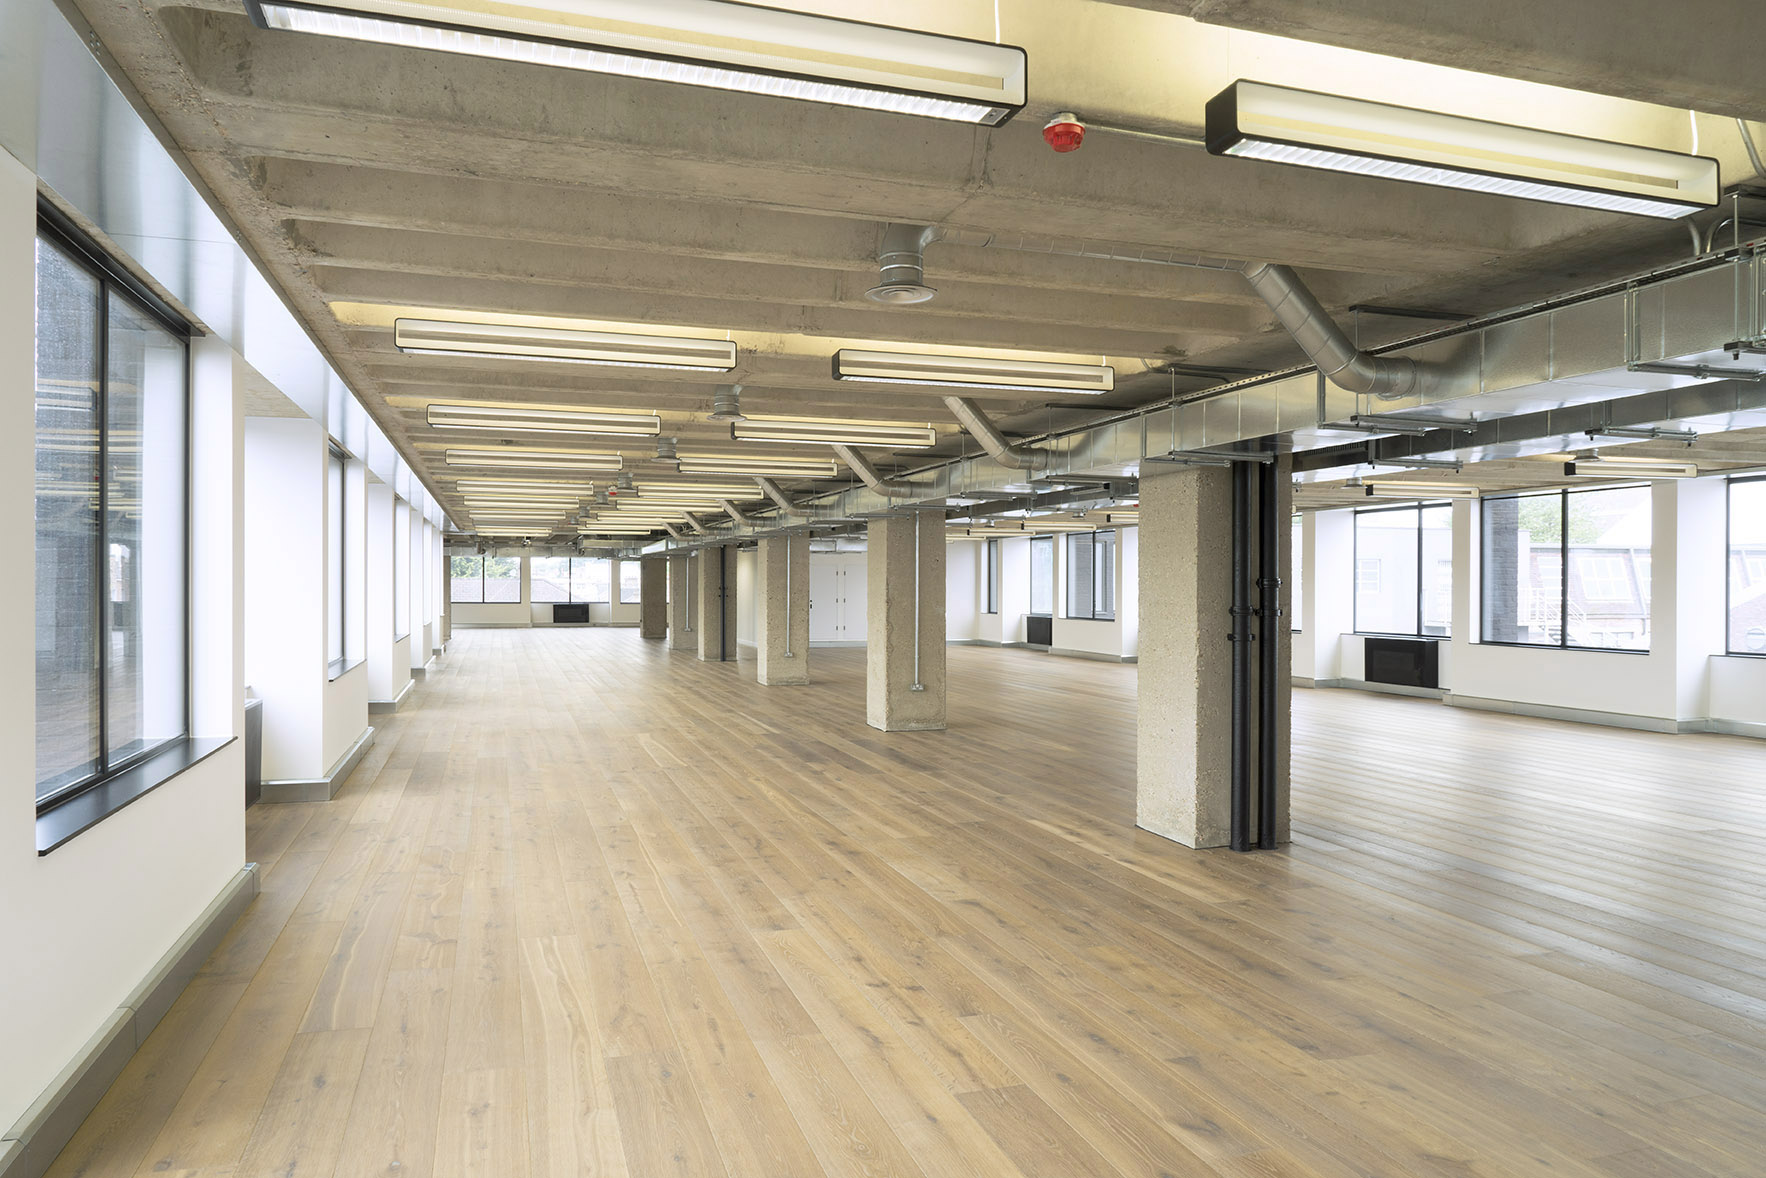 How Many Buildings Has Wren Christopher Designed